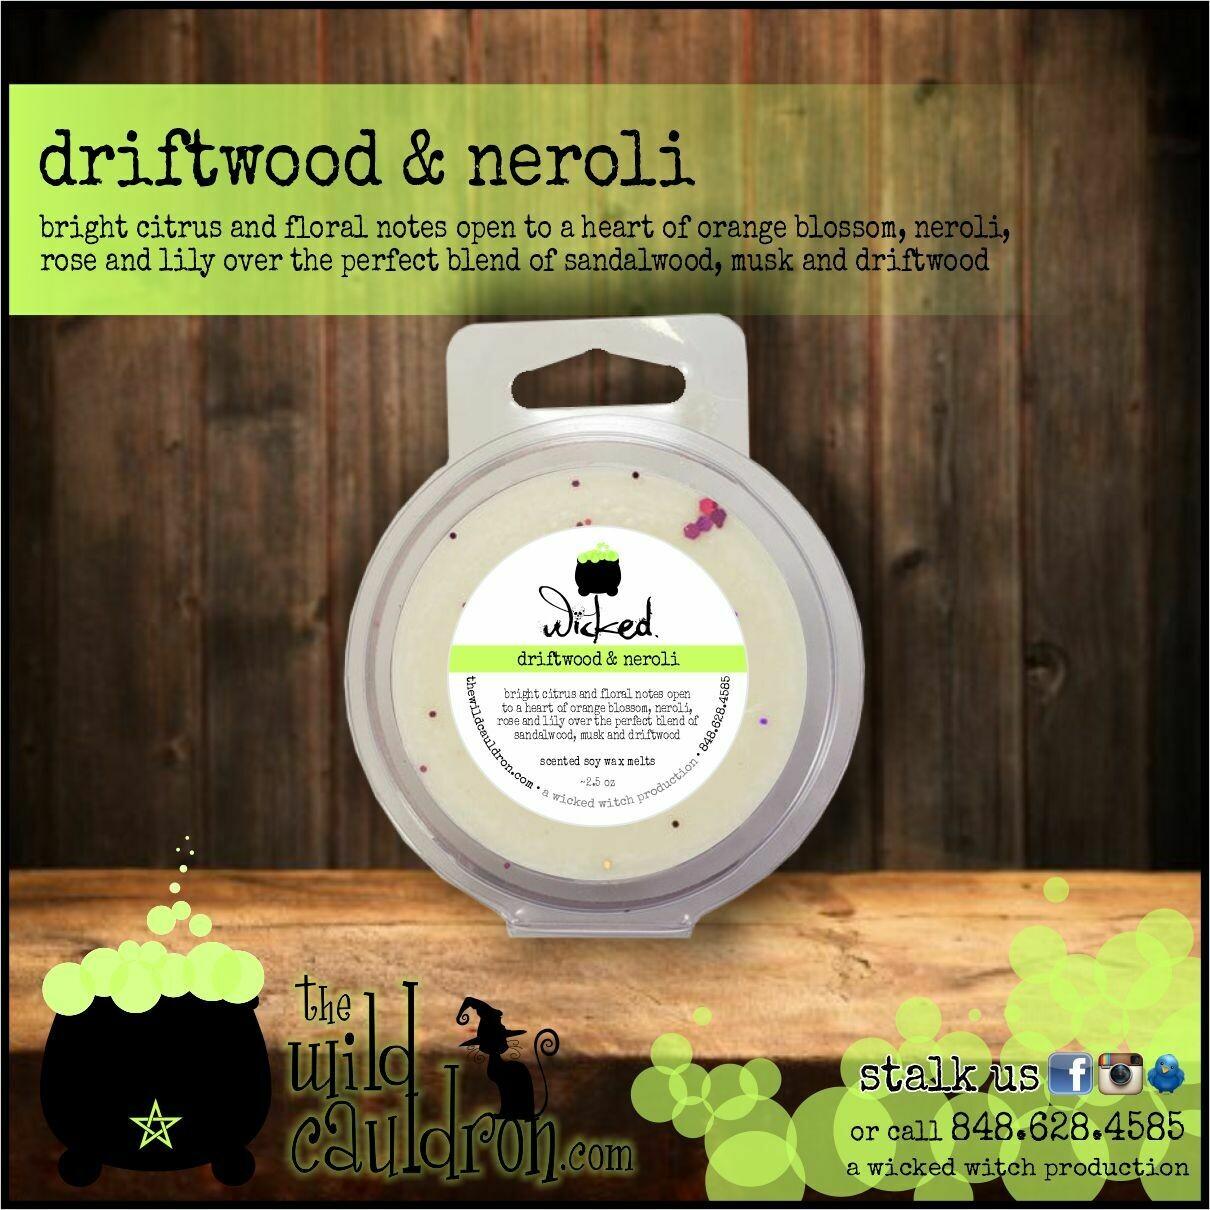 Driftwood and Neroli Wicked Wax Melts